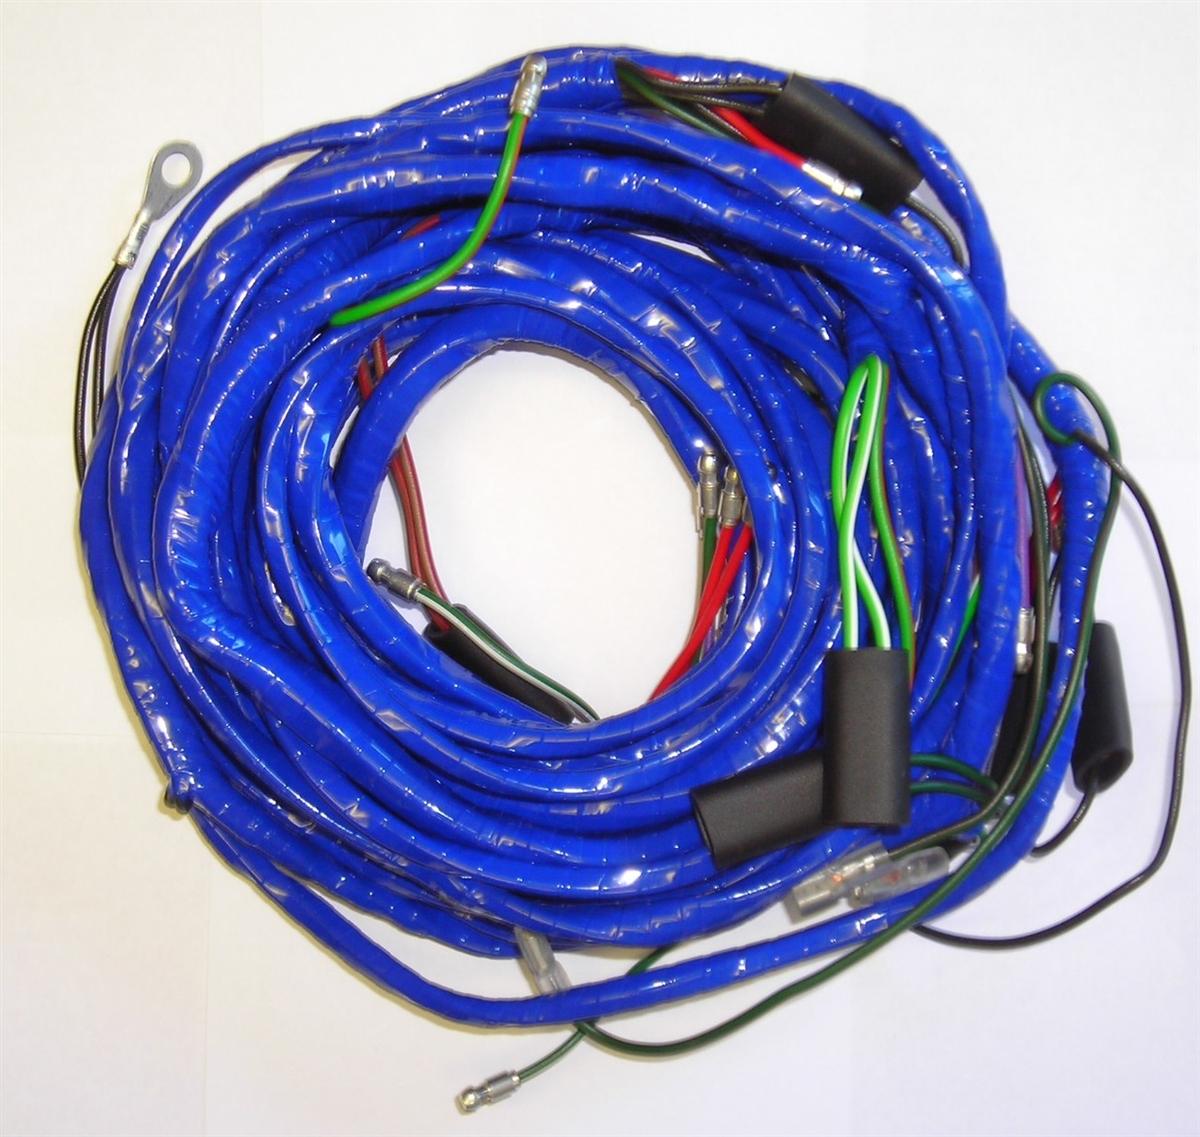 body wiring harness mg midget 1973 mg midget wiring harness mg midget wiring harness #37